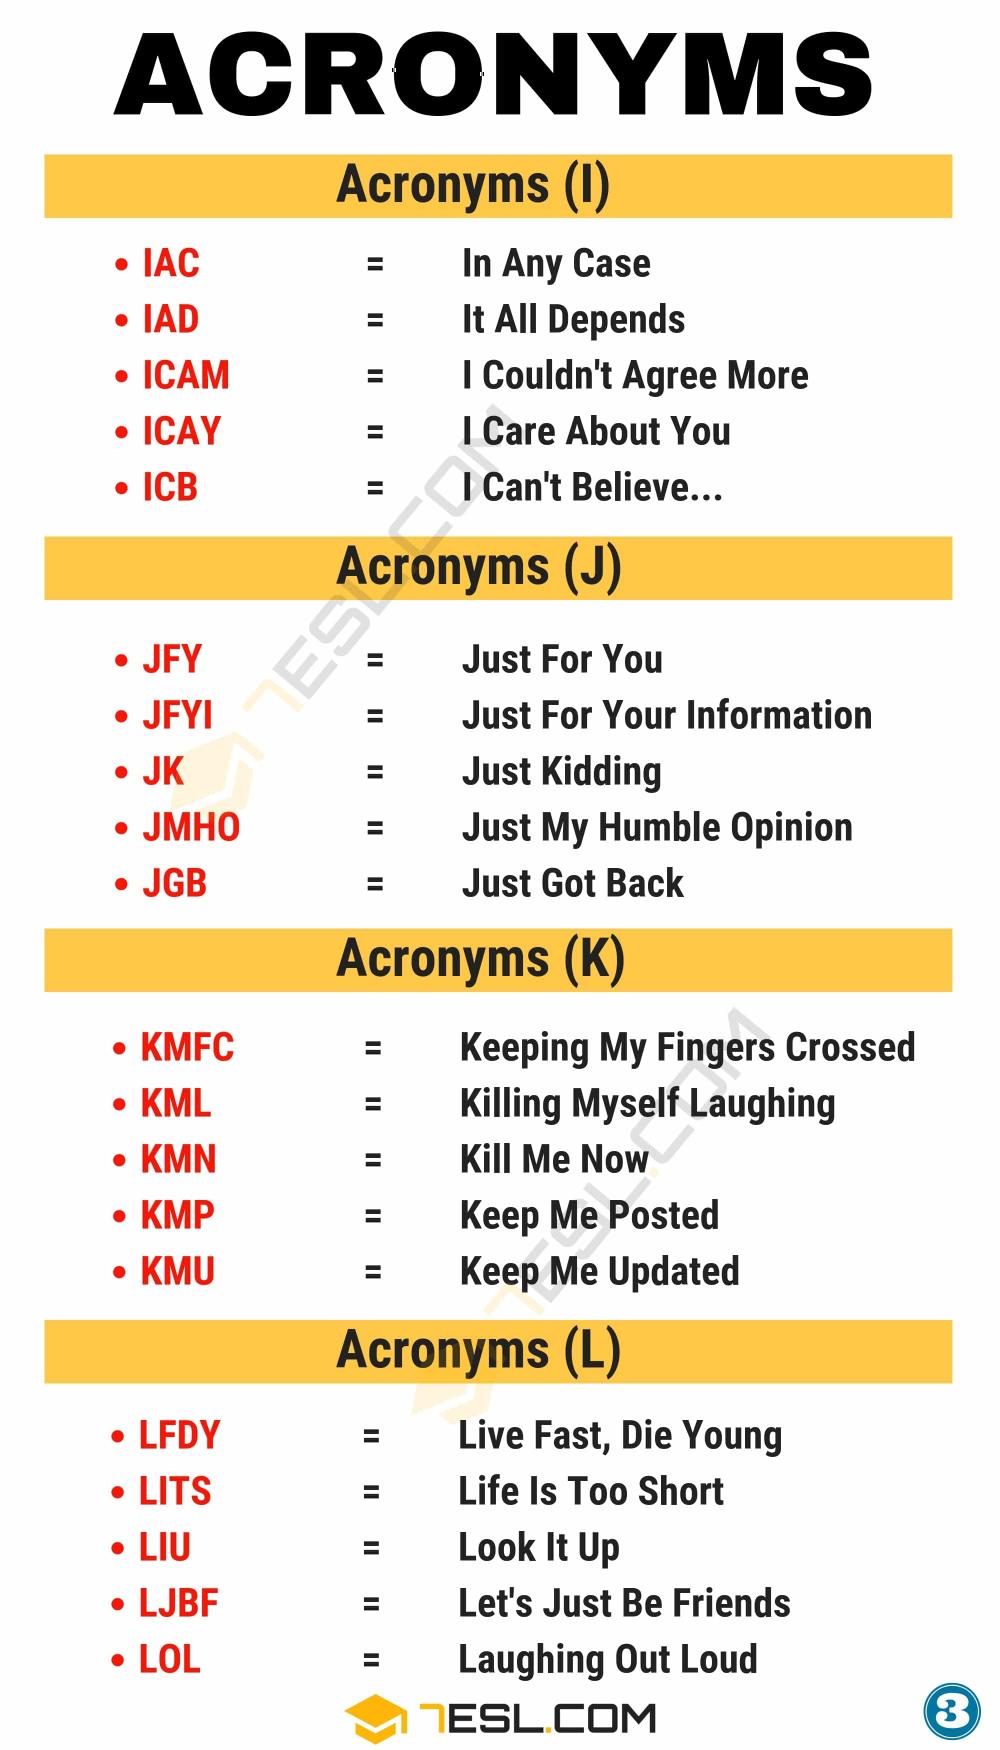 Pin by 7esl.com on Learn English   Acronym words, Learn english ...